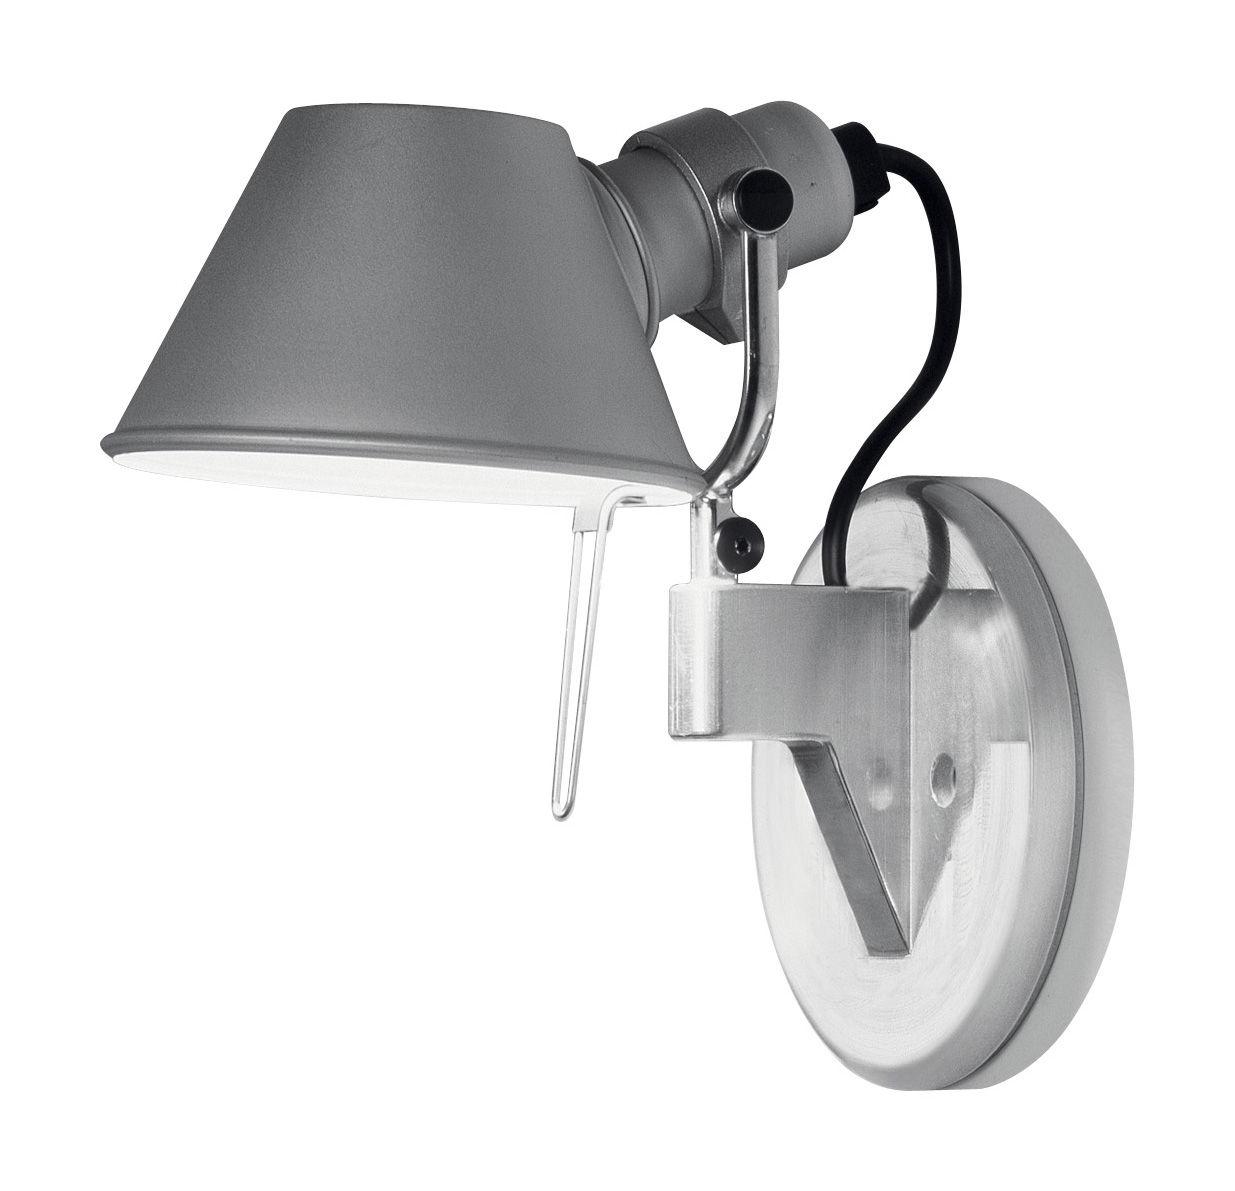 Lighting - Wall Lights - Tolomeo micro Faretto LED Wall light - LED - H 20 cm by Artemide - LED - Aluminium - Aluminium